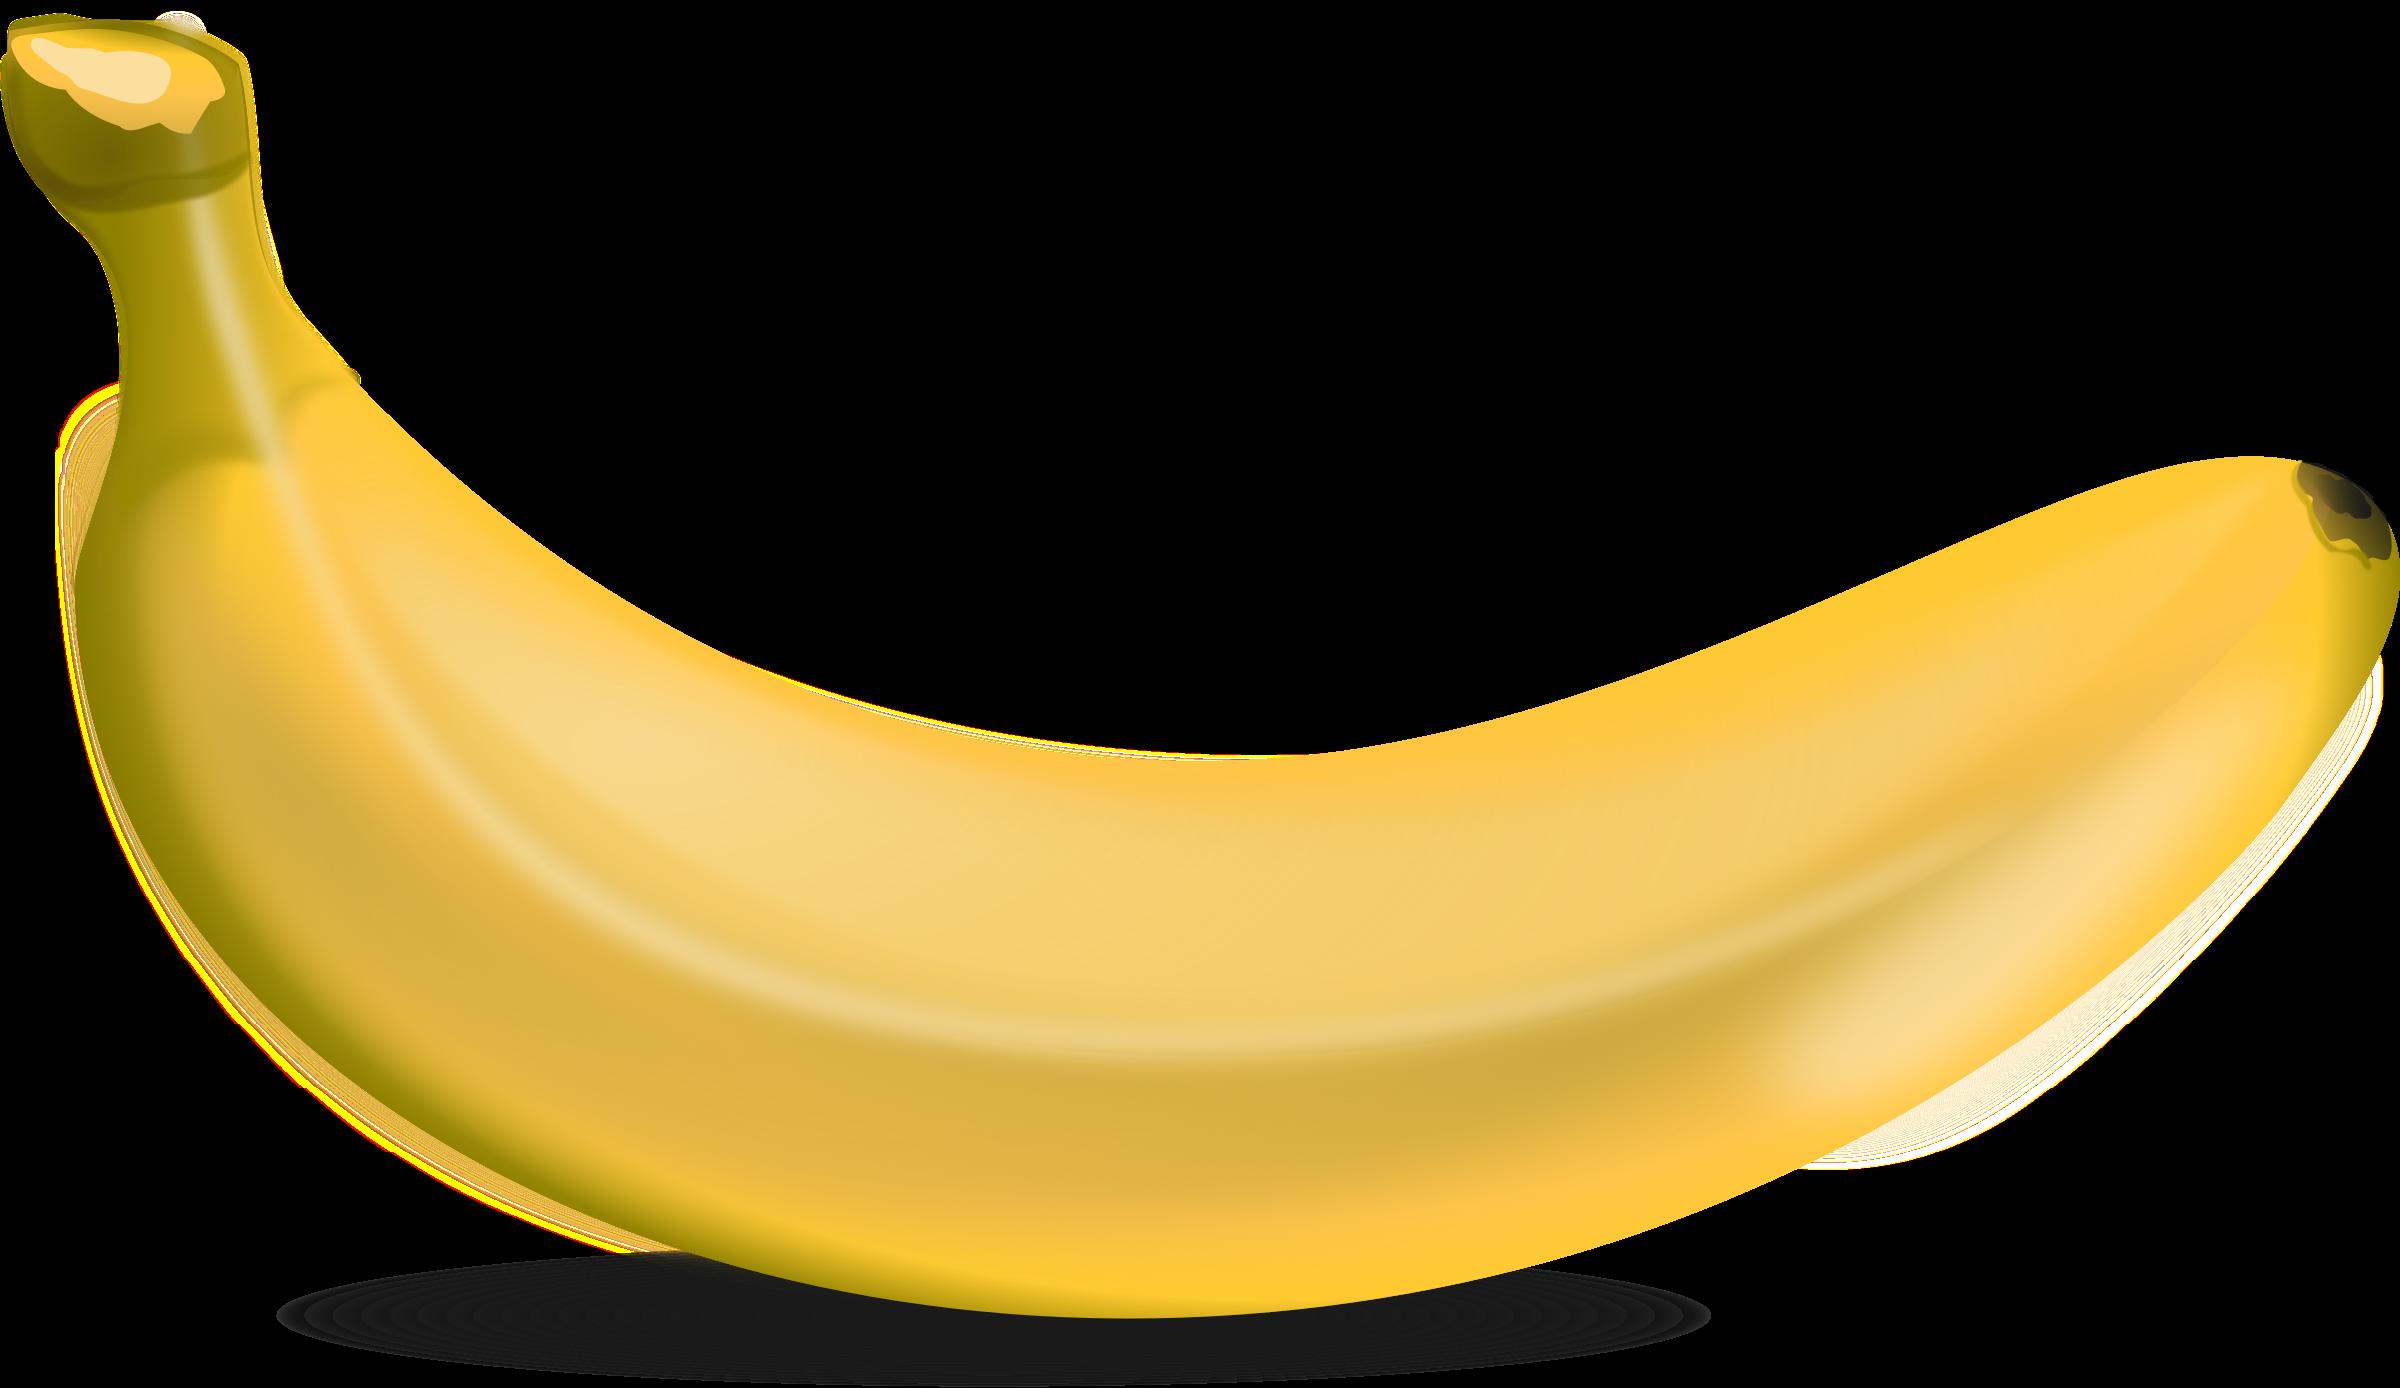 Banana Emoji Transparent Background Www Bilderbeste Com